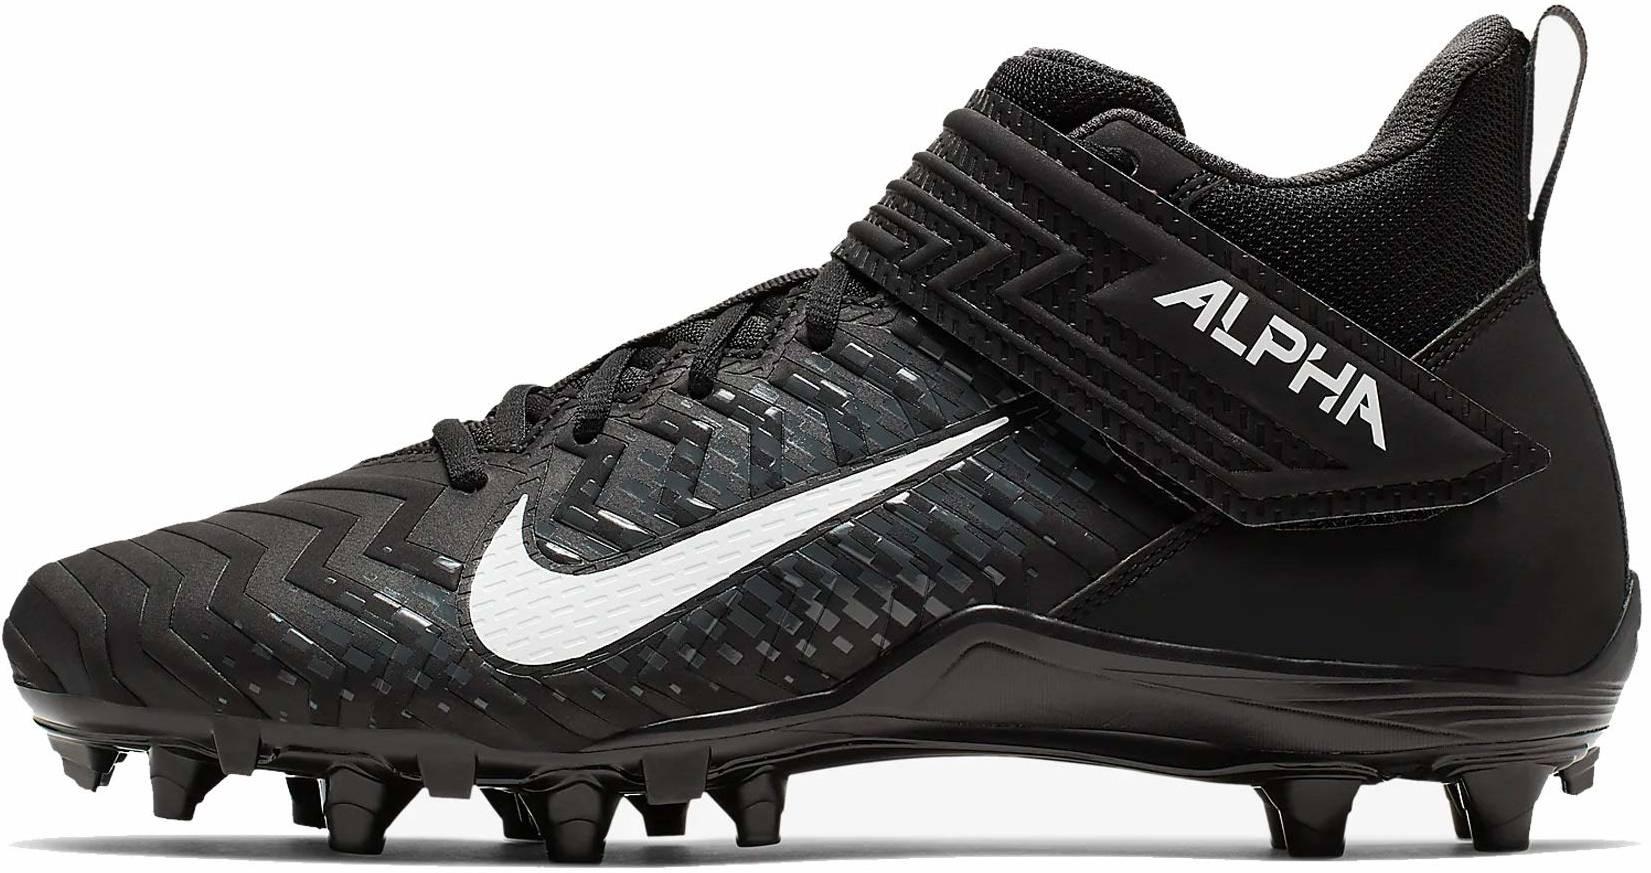 Save 50% on Nike Alpha Football Cleats